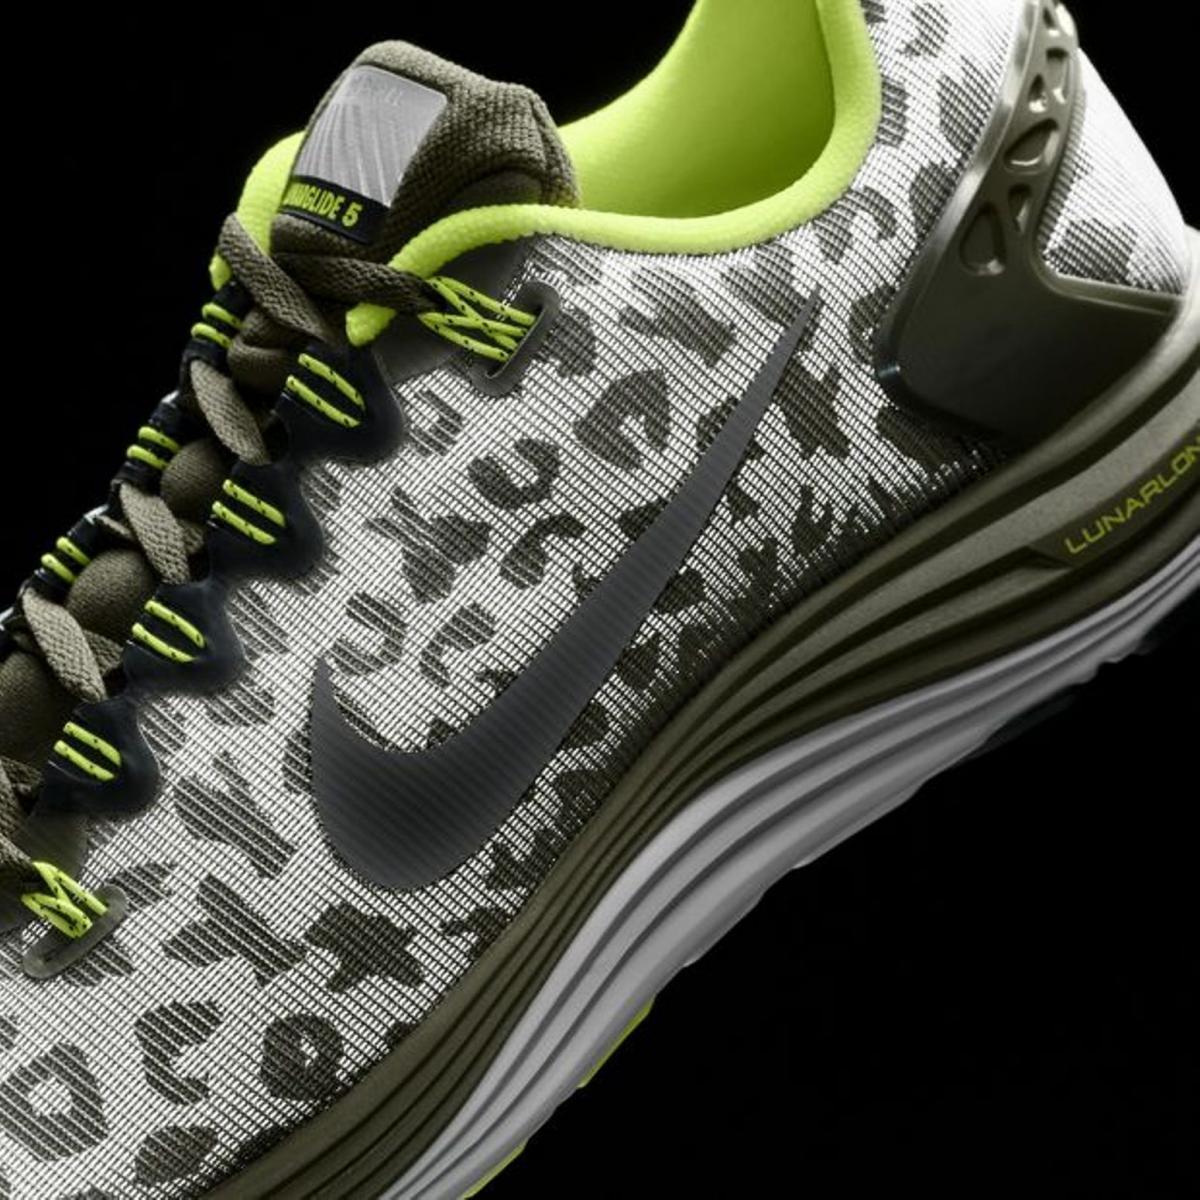 da19ee166 ... Review Nike Lunarglide 5 Shield trainers ...